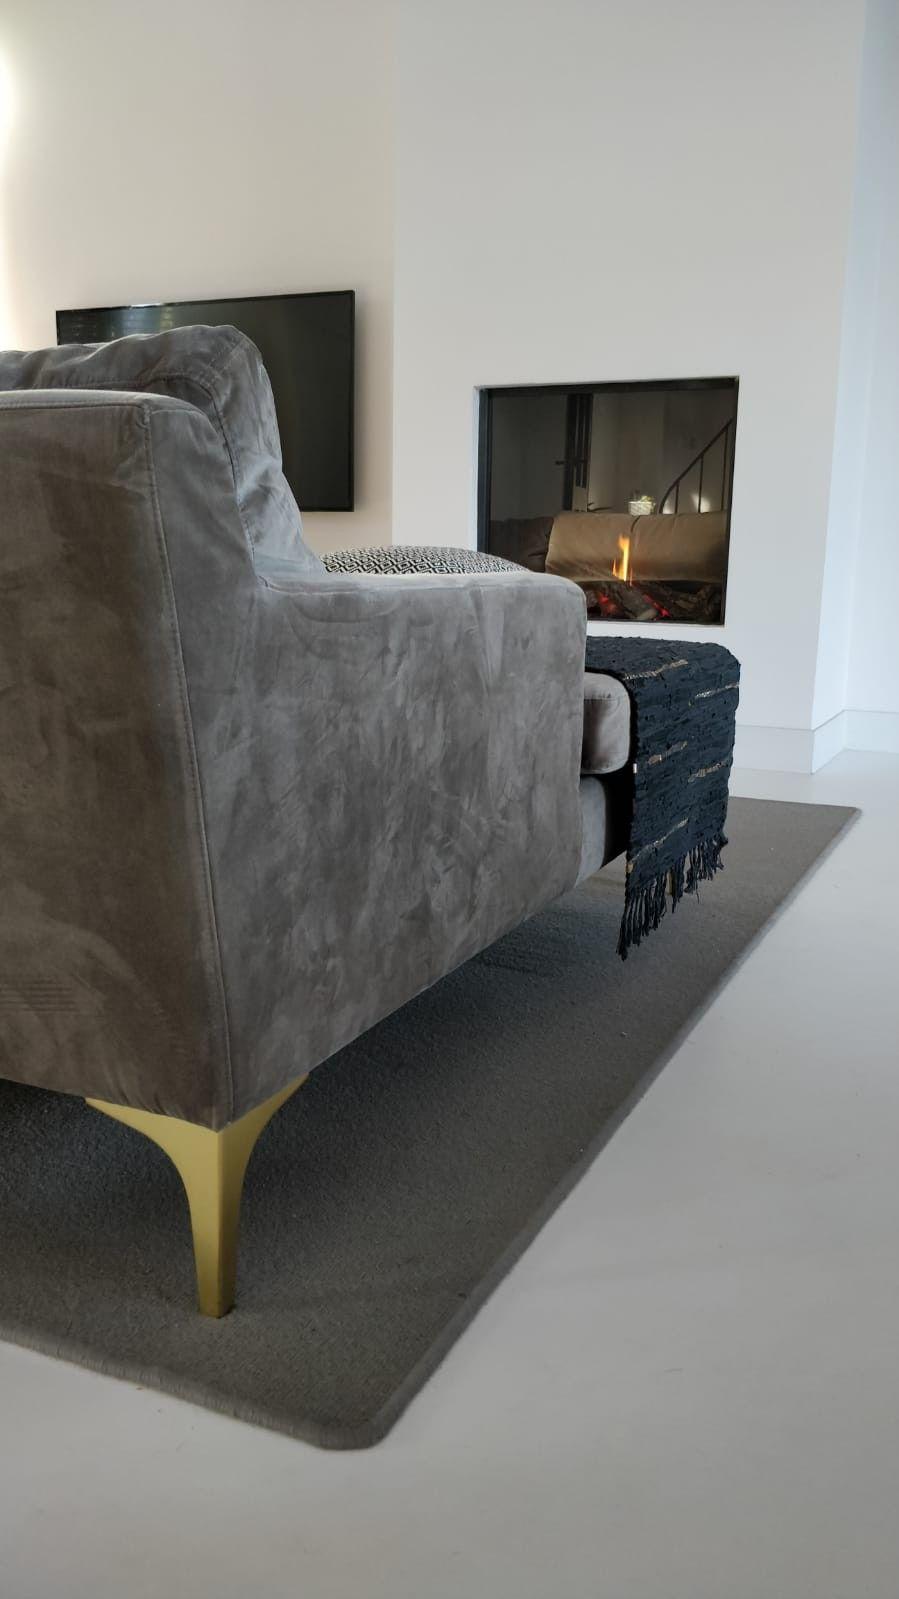 Lb57 Ringlever Haard Sofacompany Astha Fungi Sofa I